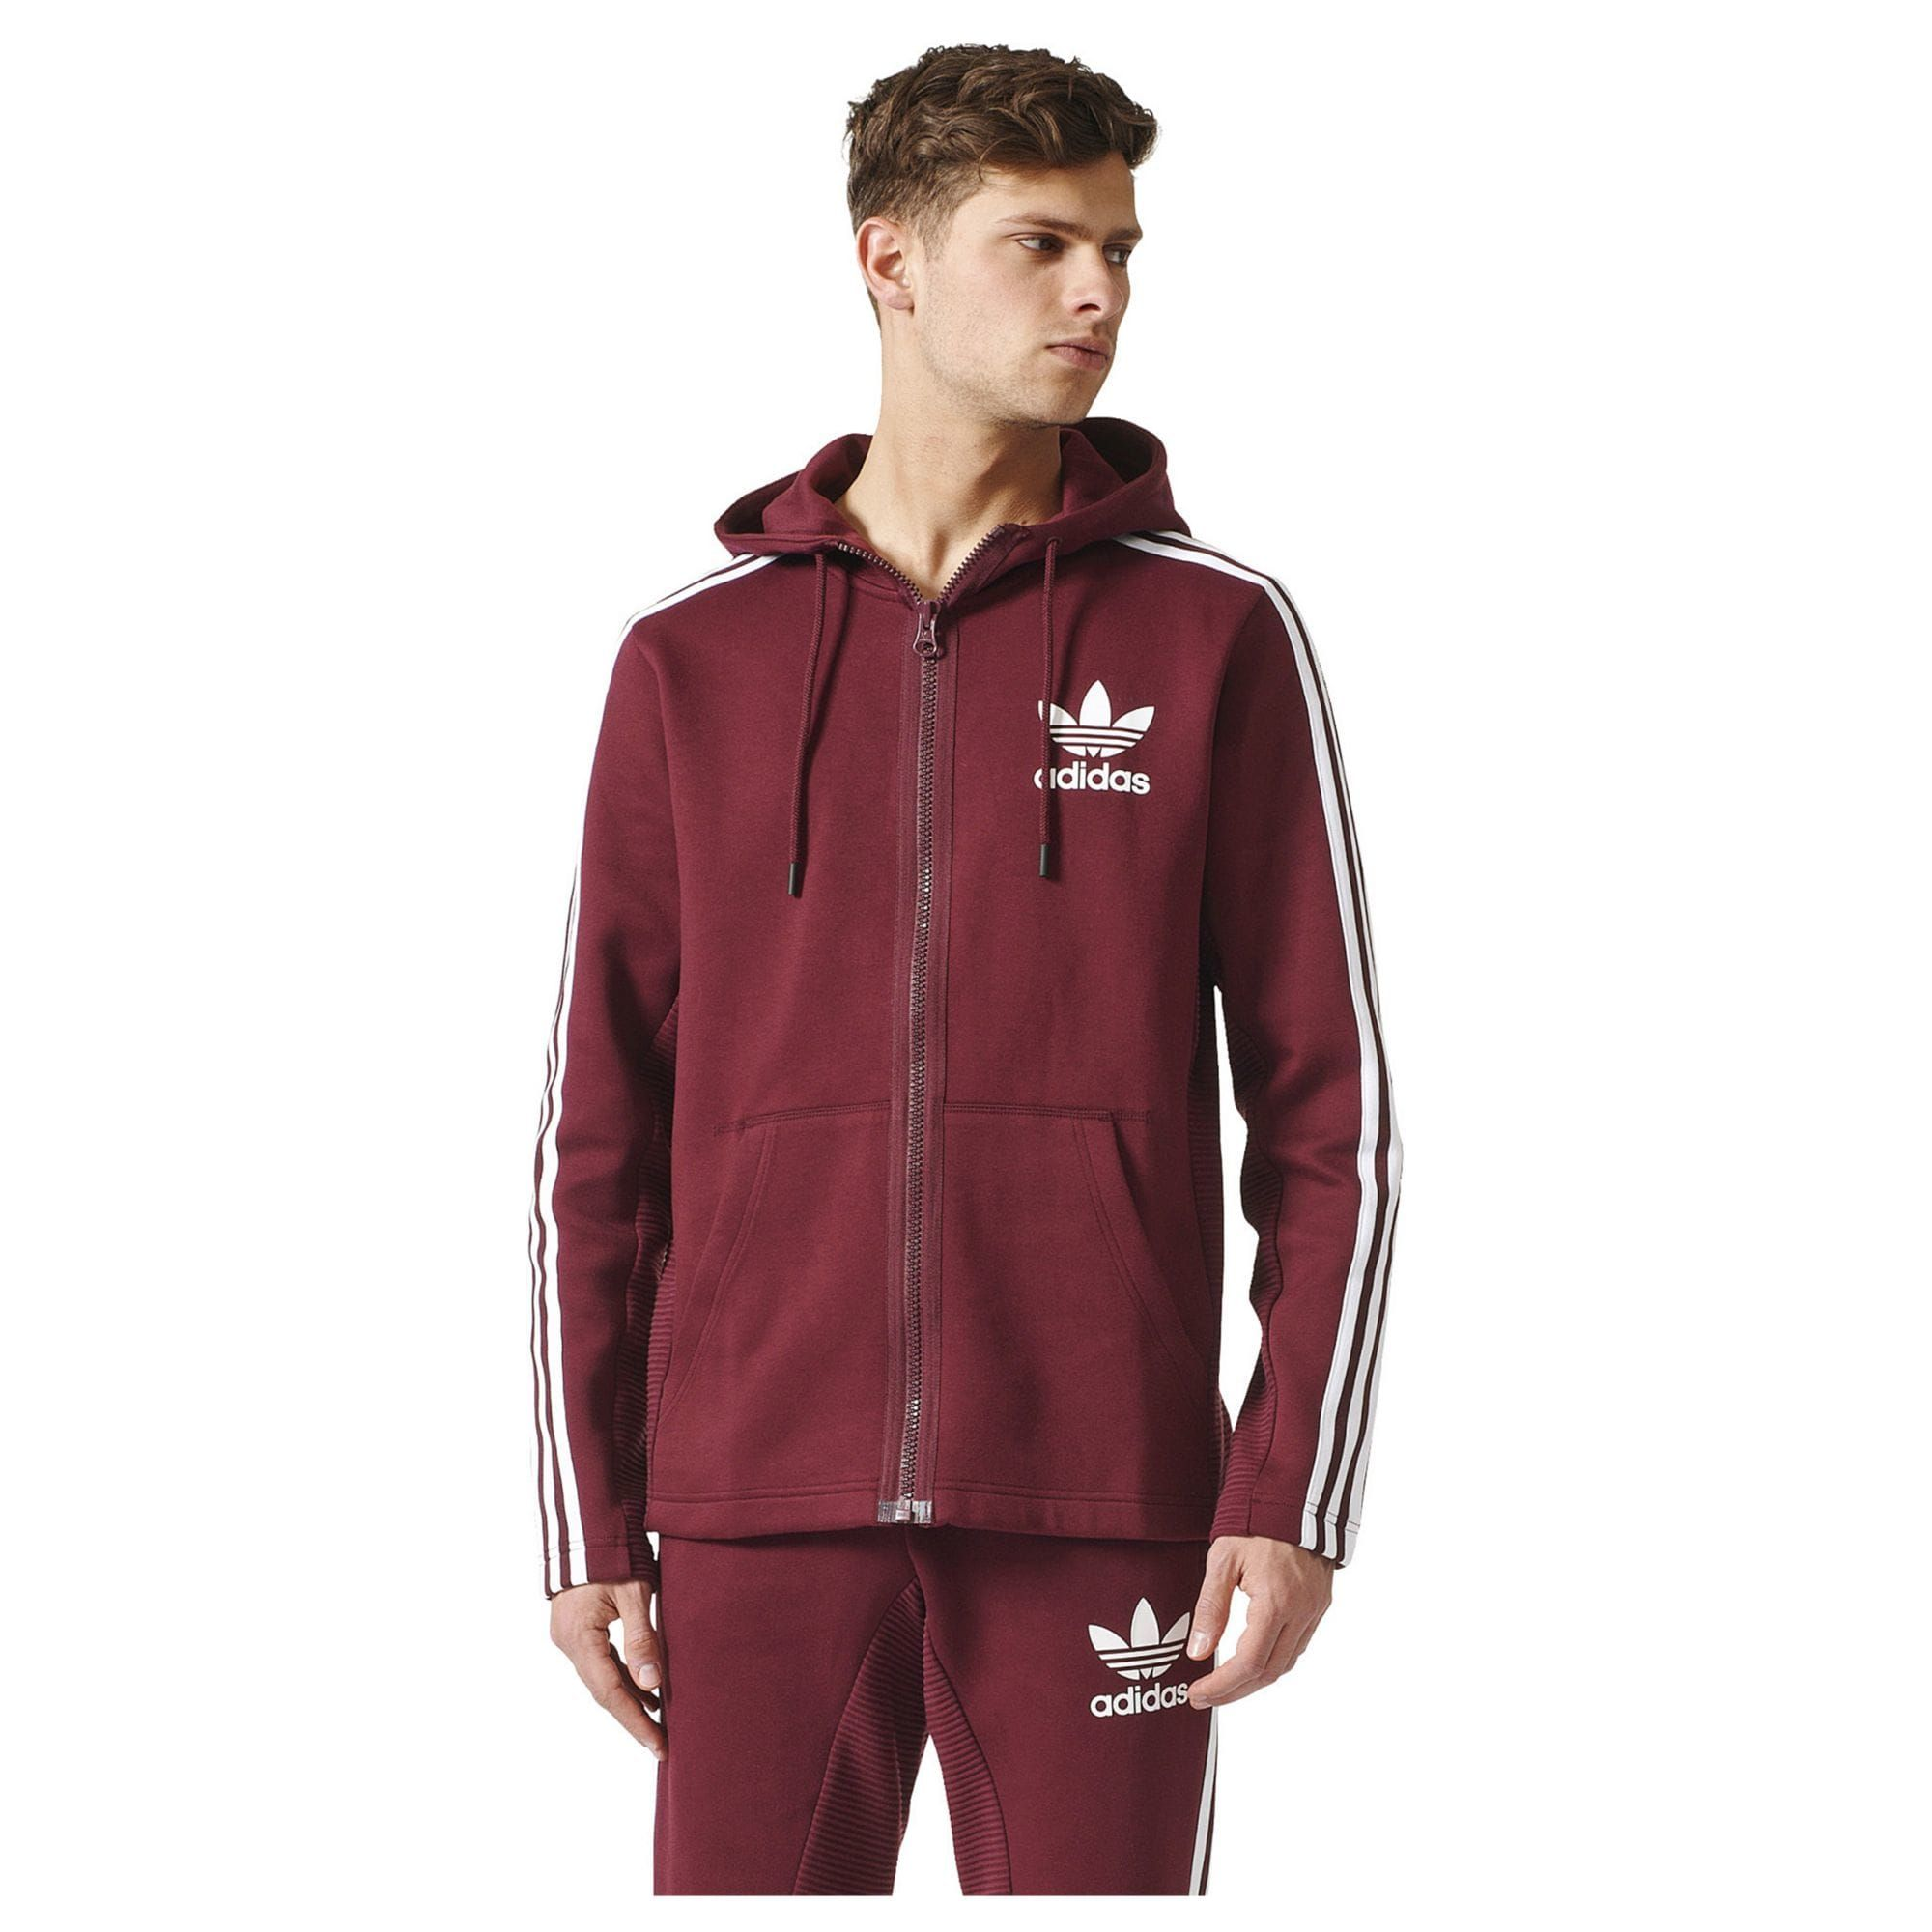 Adidas Zip Men'sWant Full Originals Hoodie Curated 8mN0Ovnw